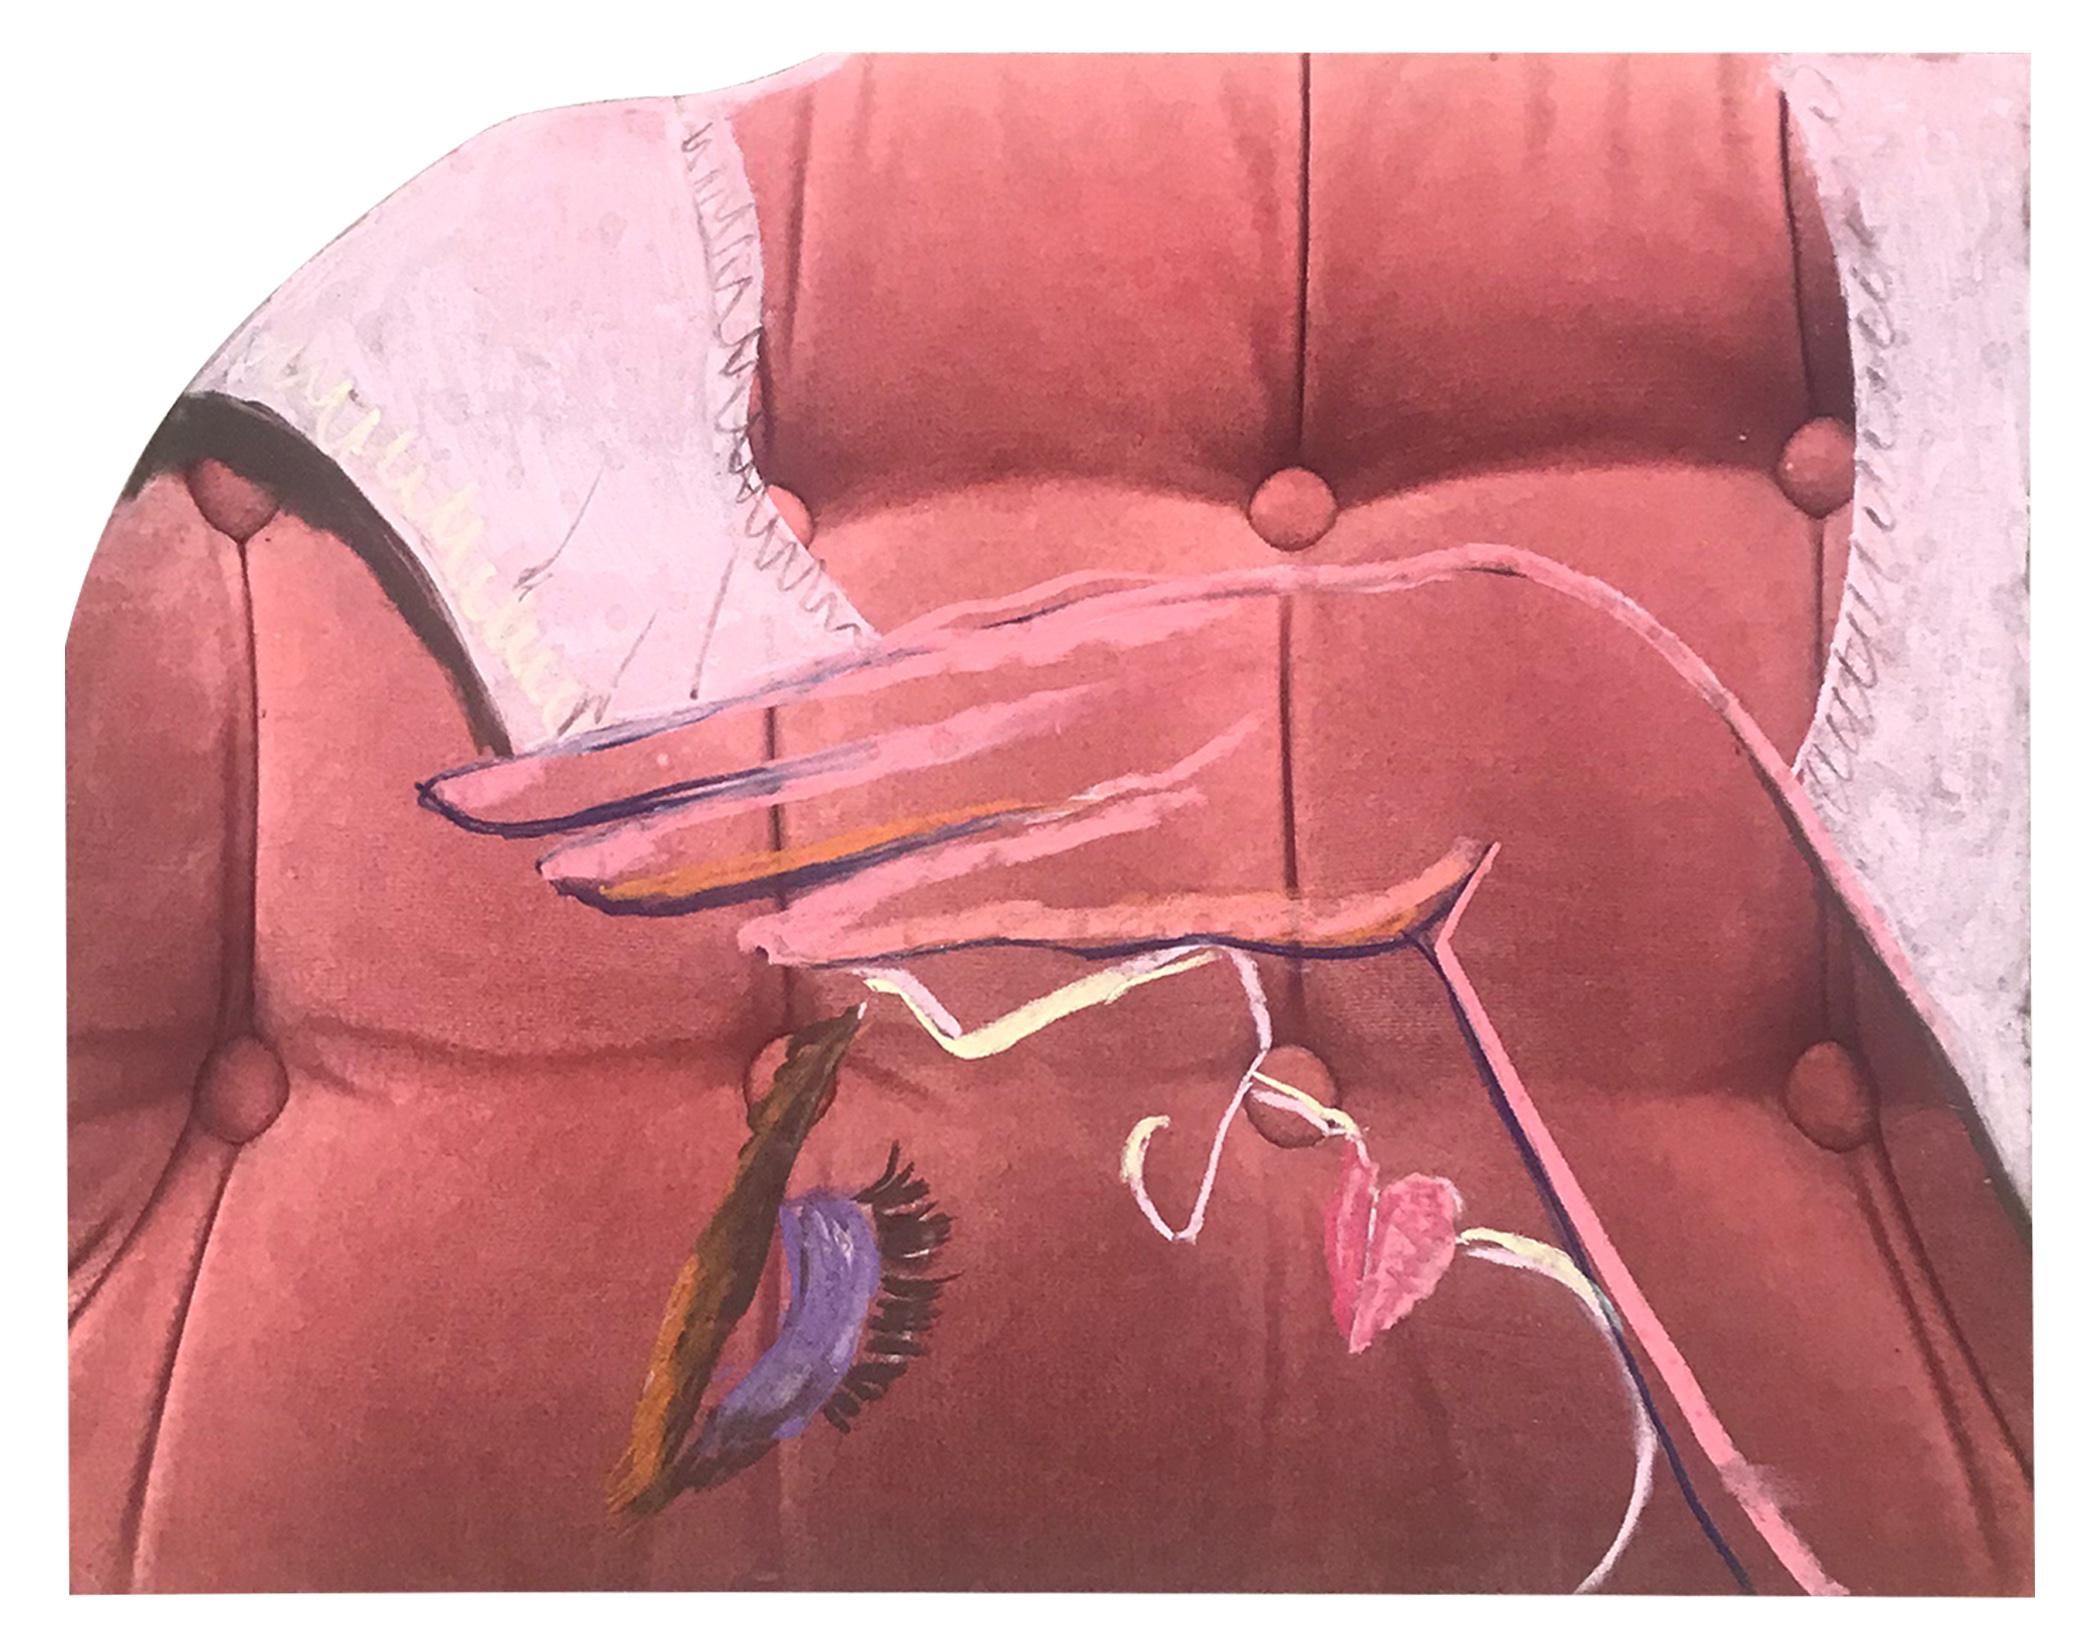 "HEAL ME 8"" x 10"" Chalk Pastel on Archival Inkjet Print $60.00    BUY"